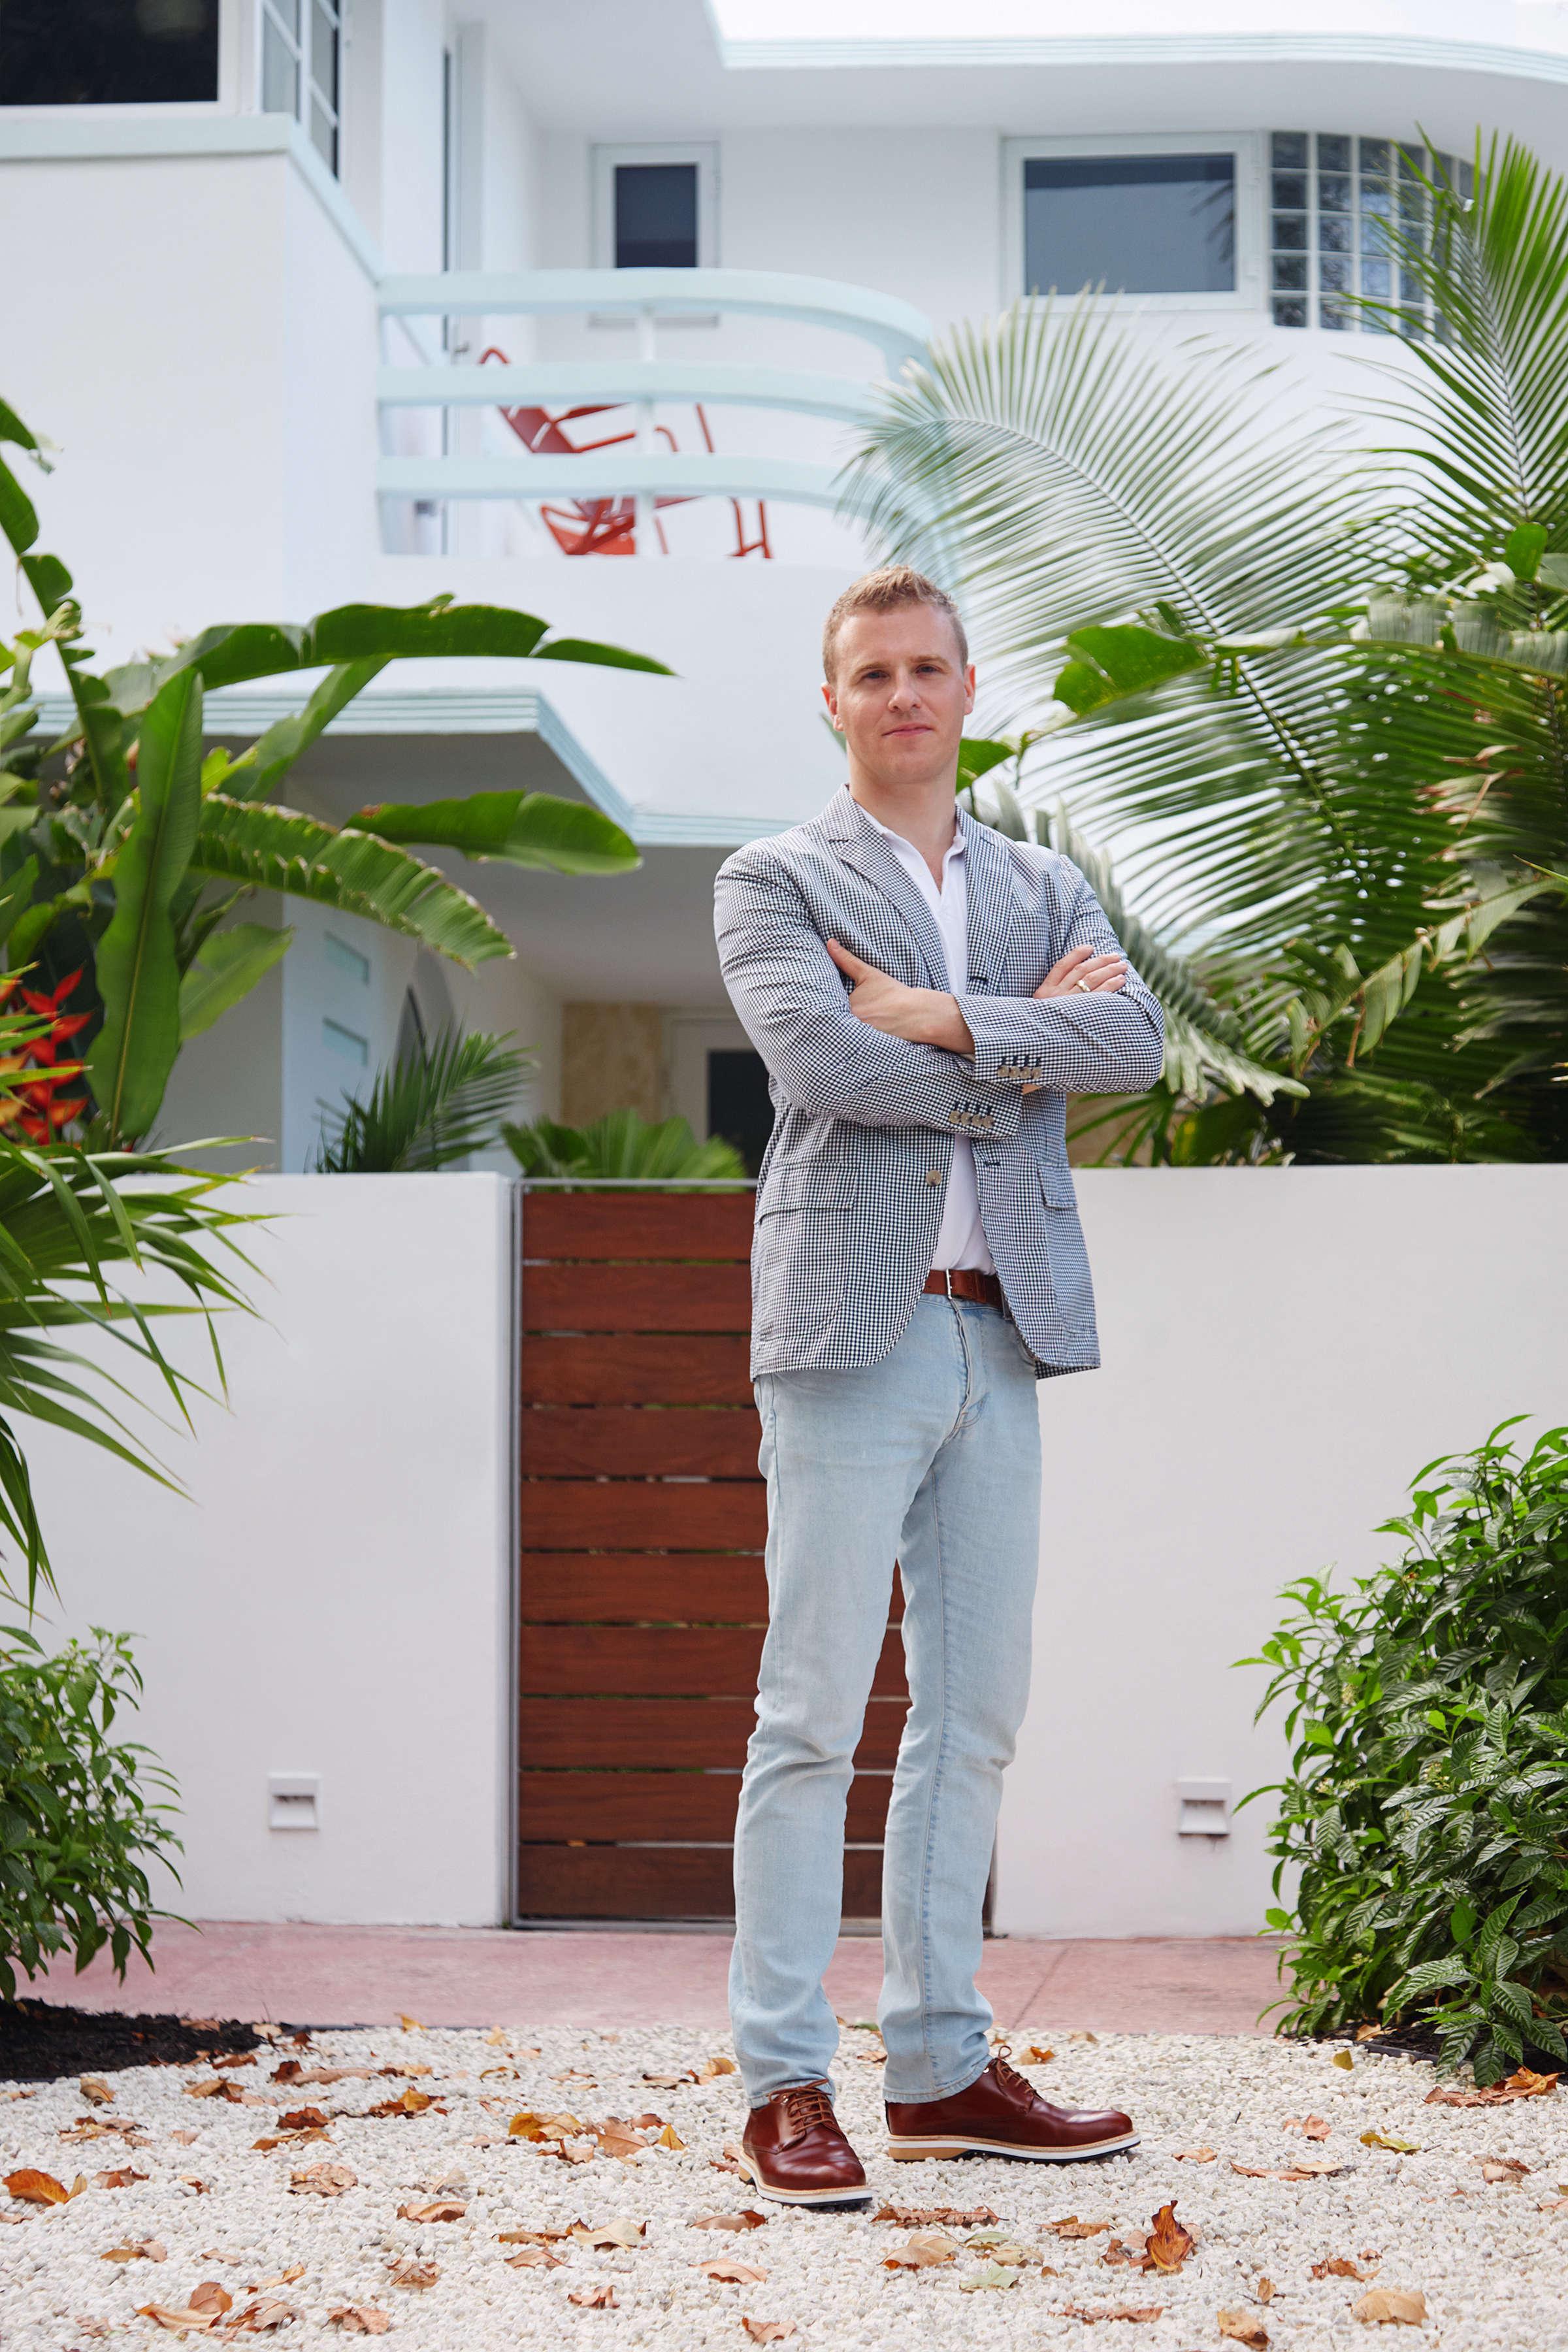 Stephan-Weishaupt Miami   Remodelista